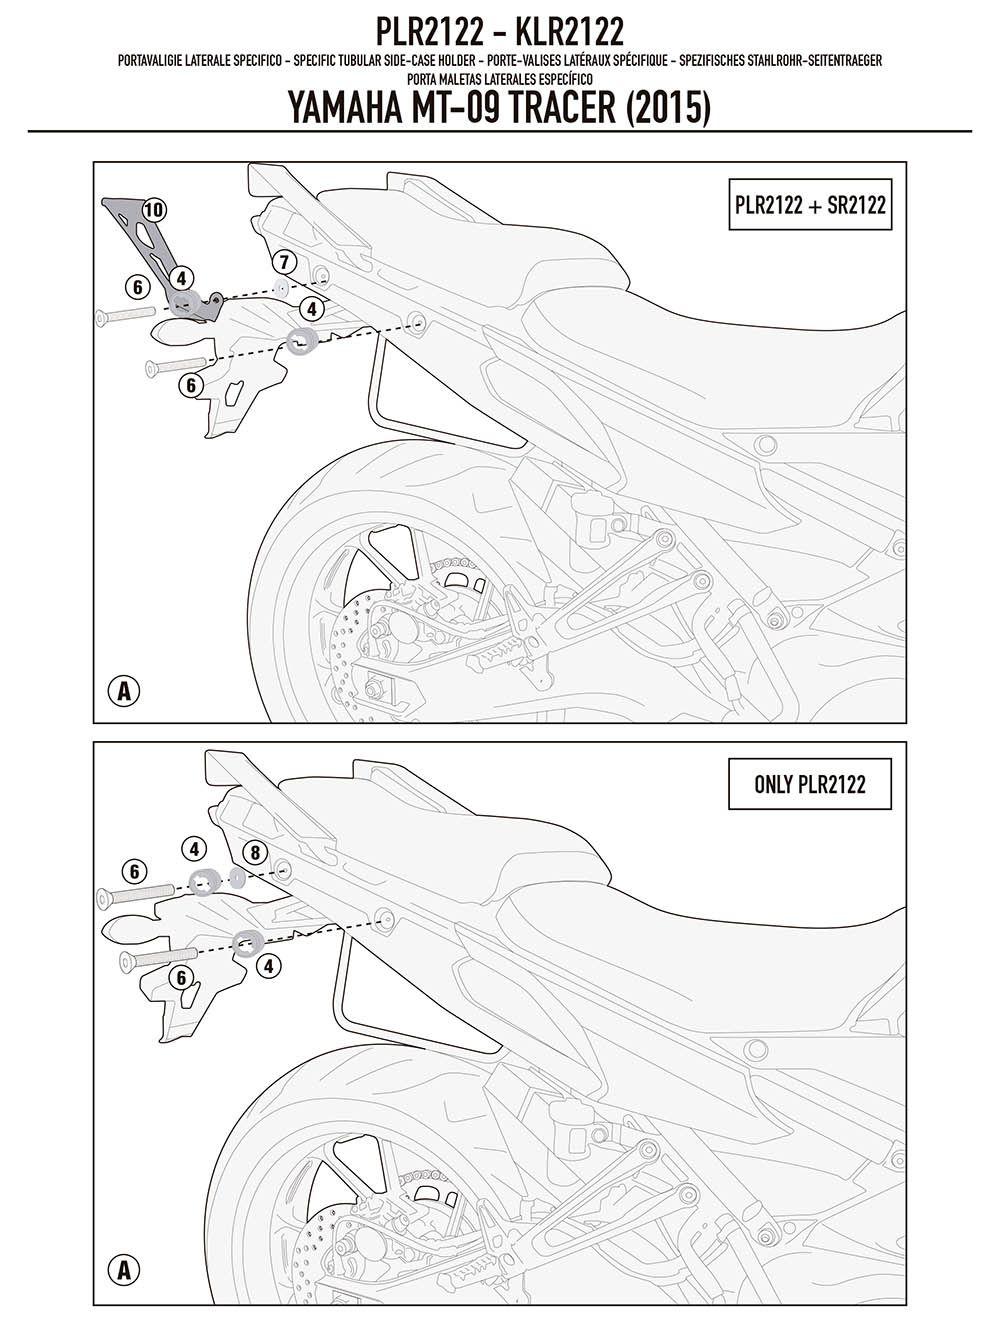 Suporte Lateral Bau Bauleto Mt 09 Trace r Givi Plr 2122